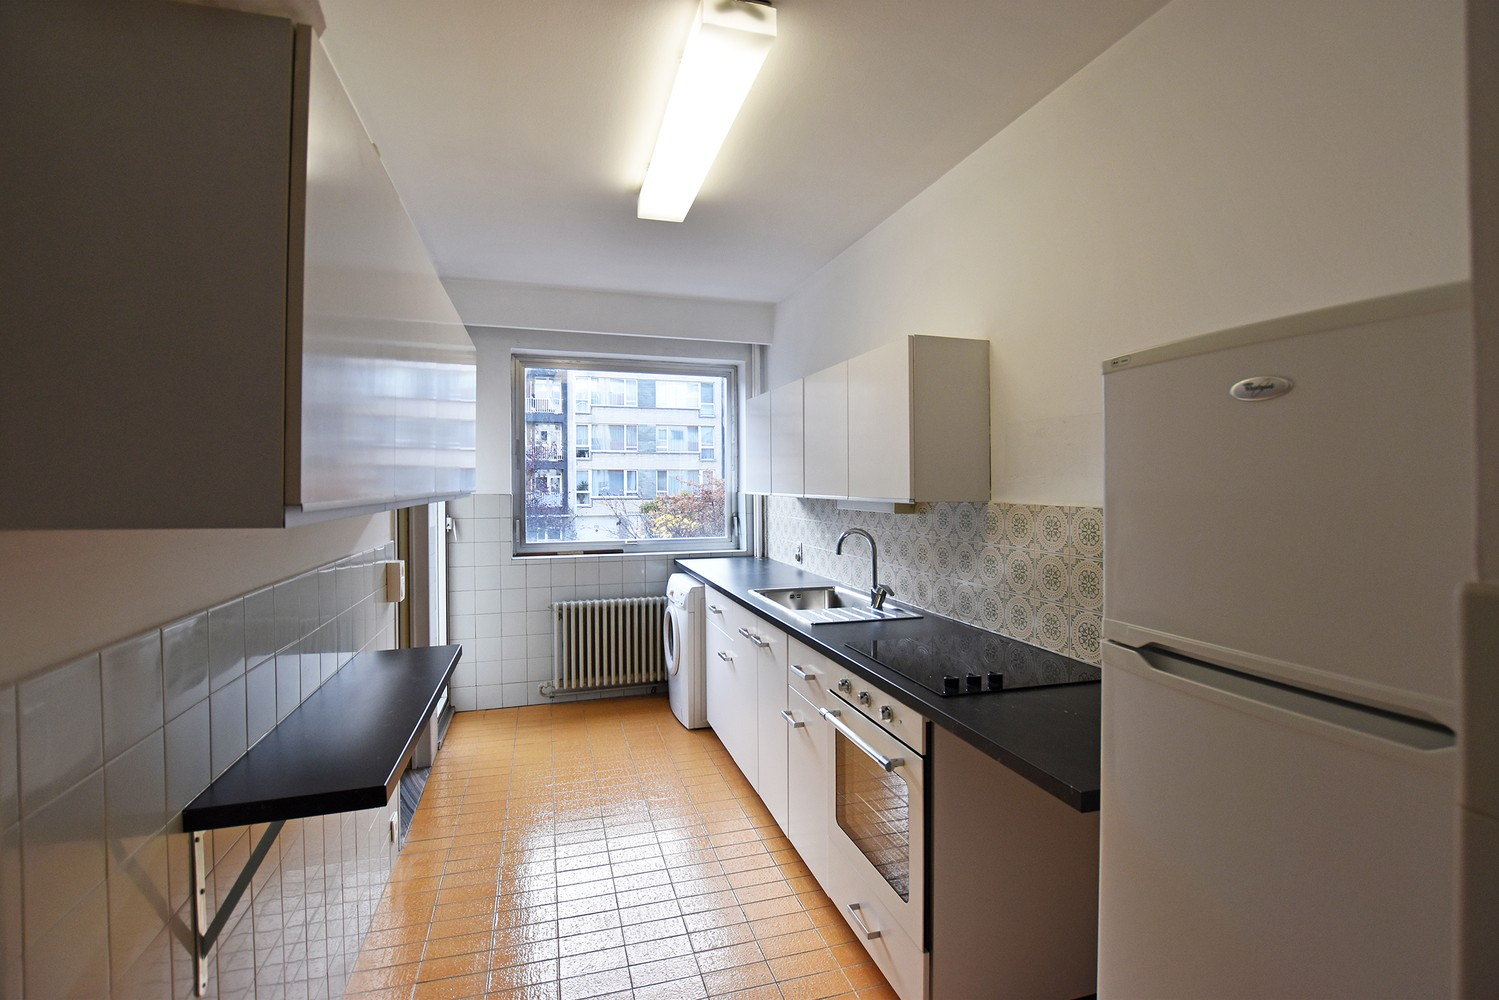 Ruim appartement (+/- 110 m²) met twee slaapkamers en lift te Borgerhout! afbeelding 3